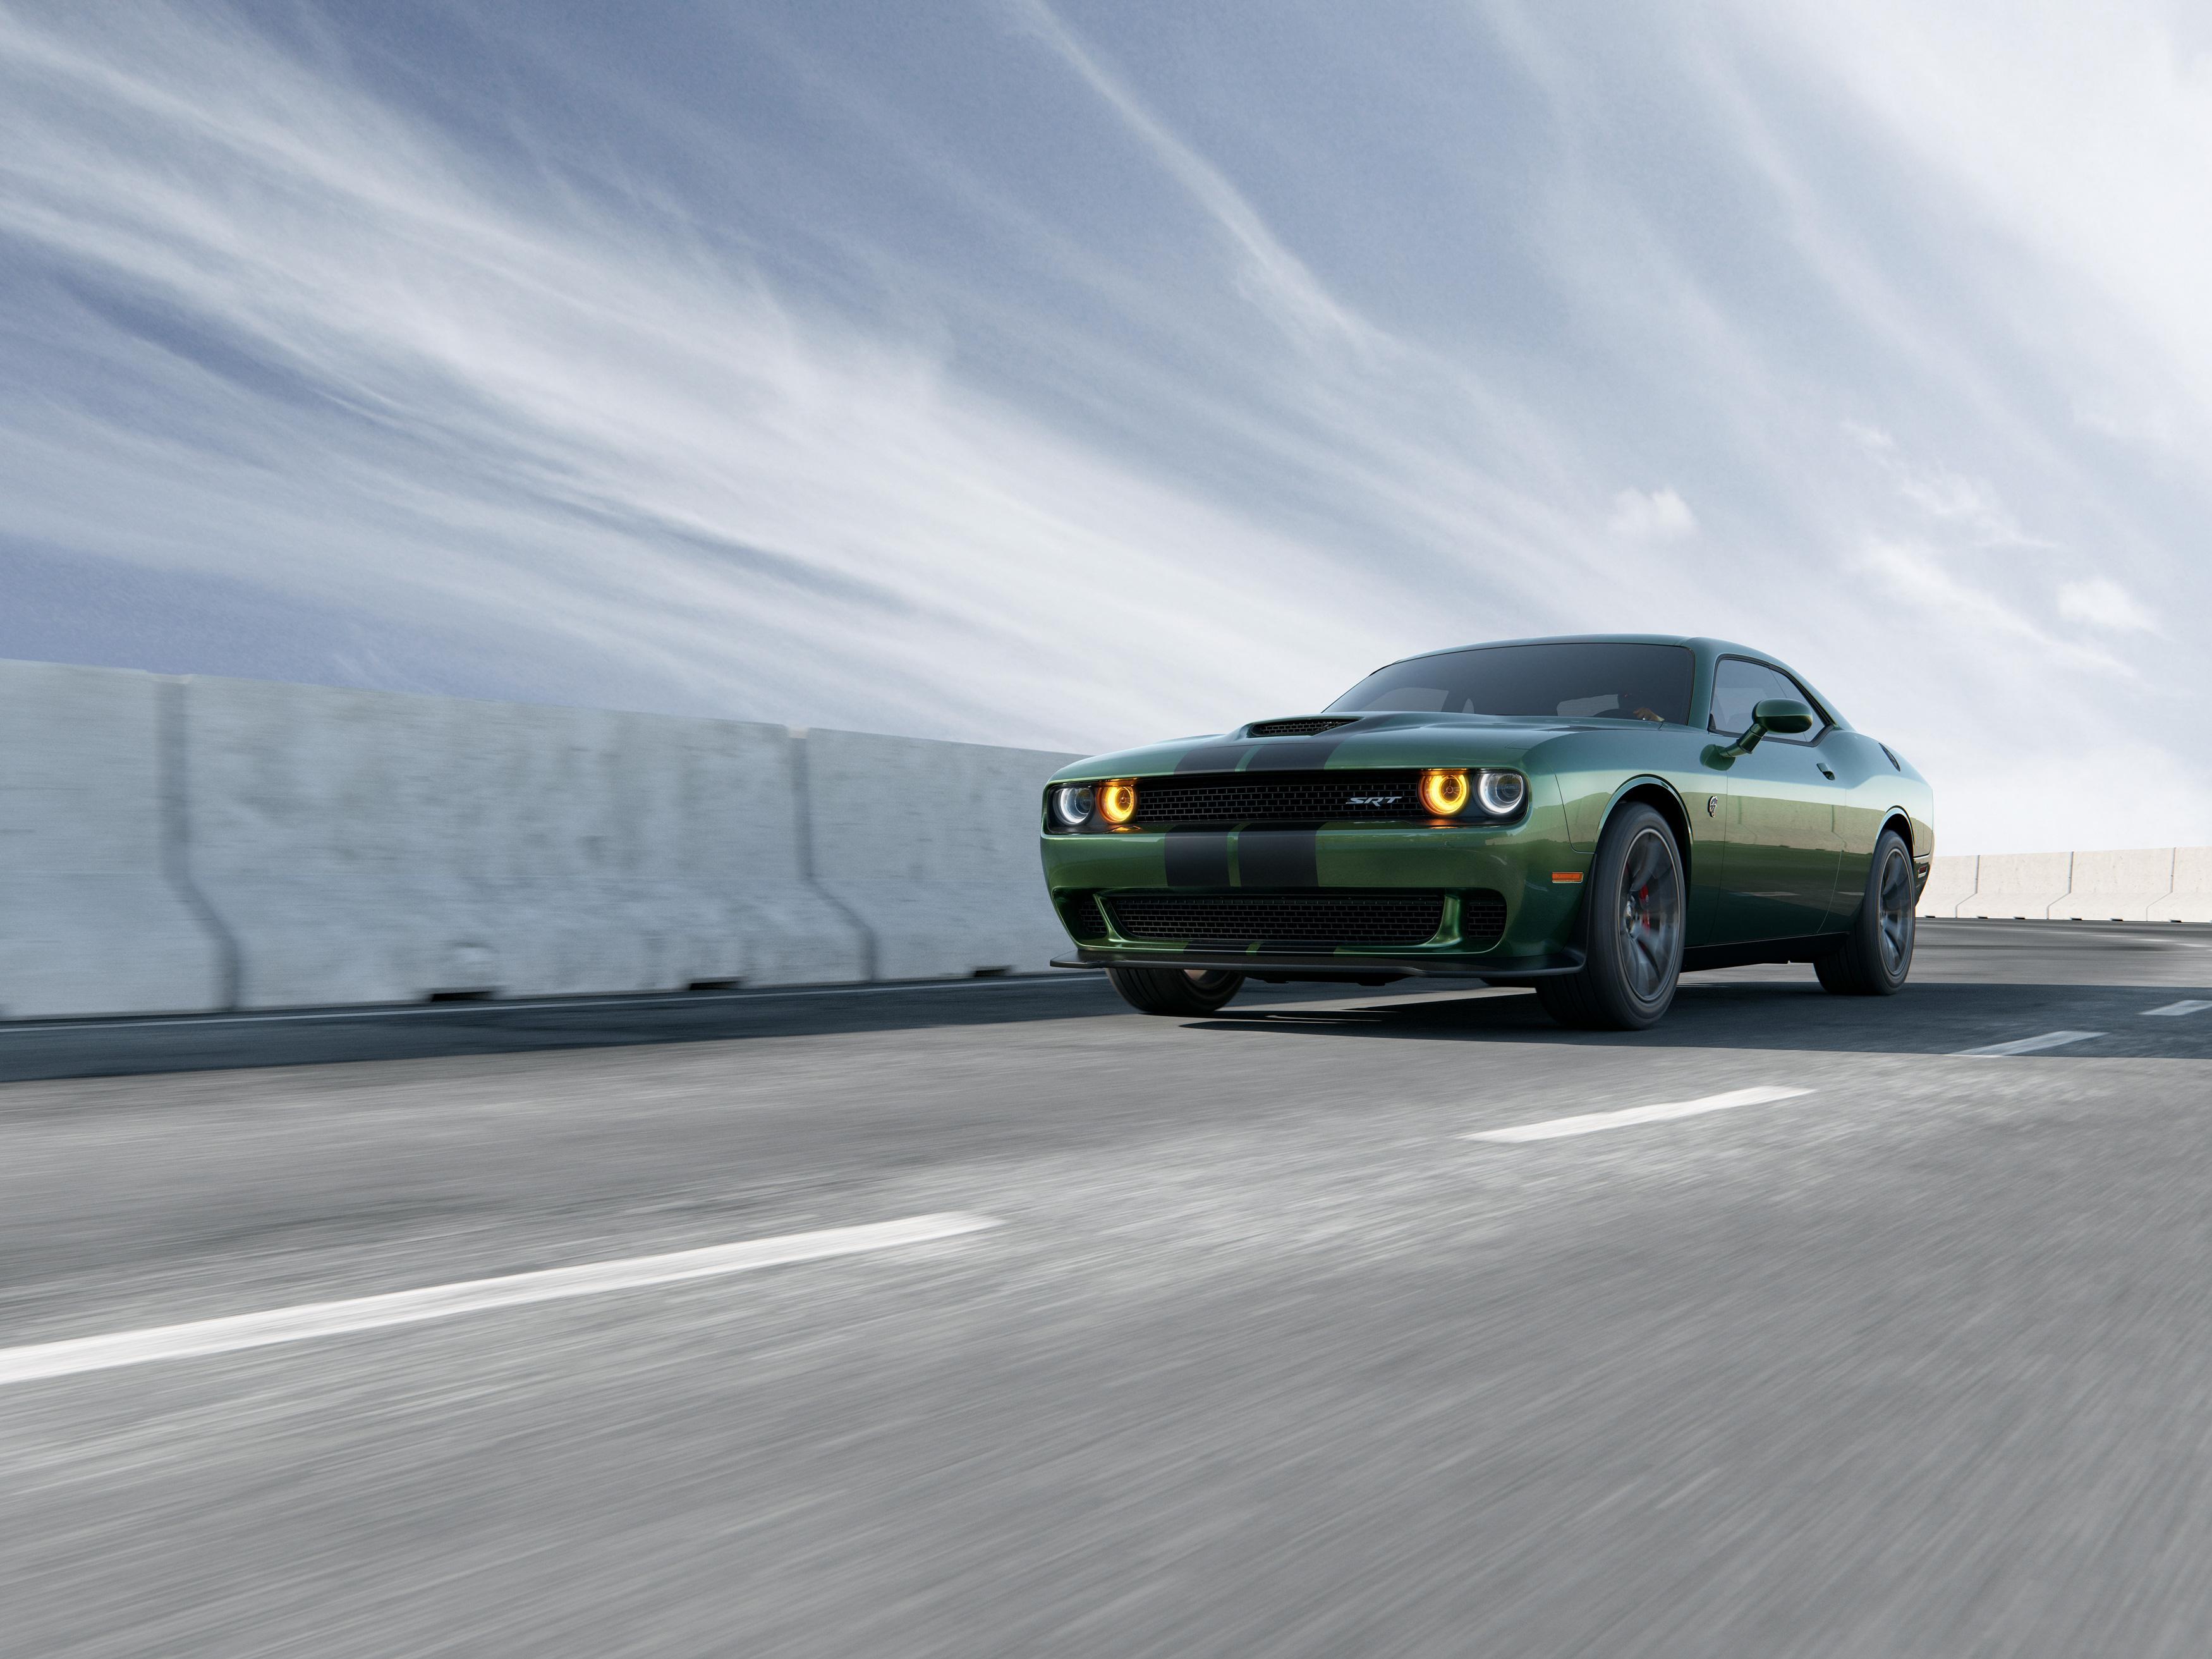 Car Dodge Dodge Challenger Dodge Challenger Srt Green Car Muscle Car Vehicle 3500x2625